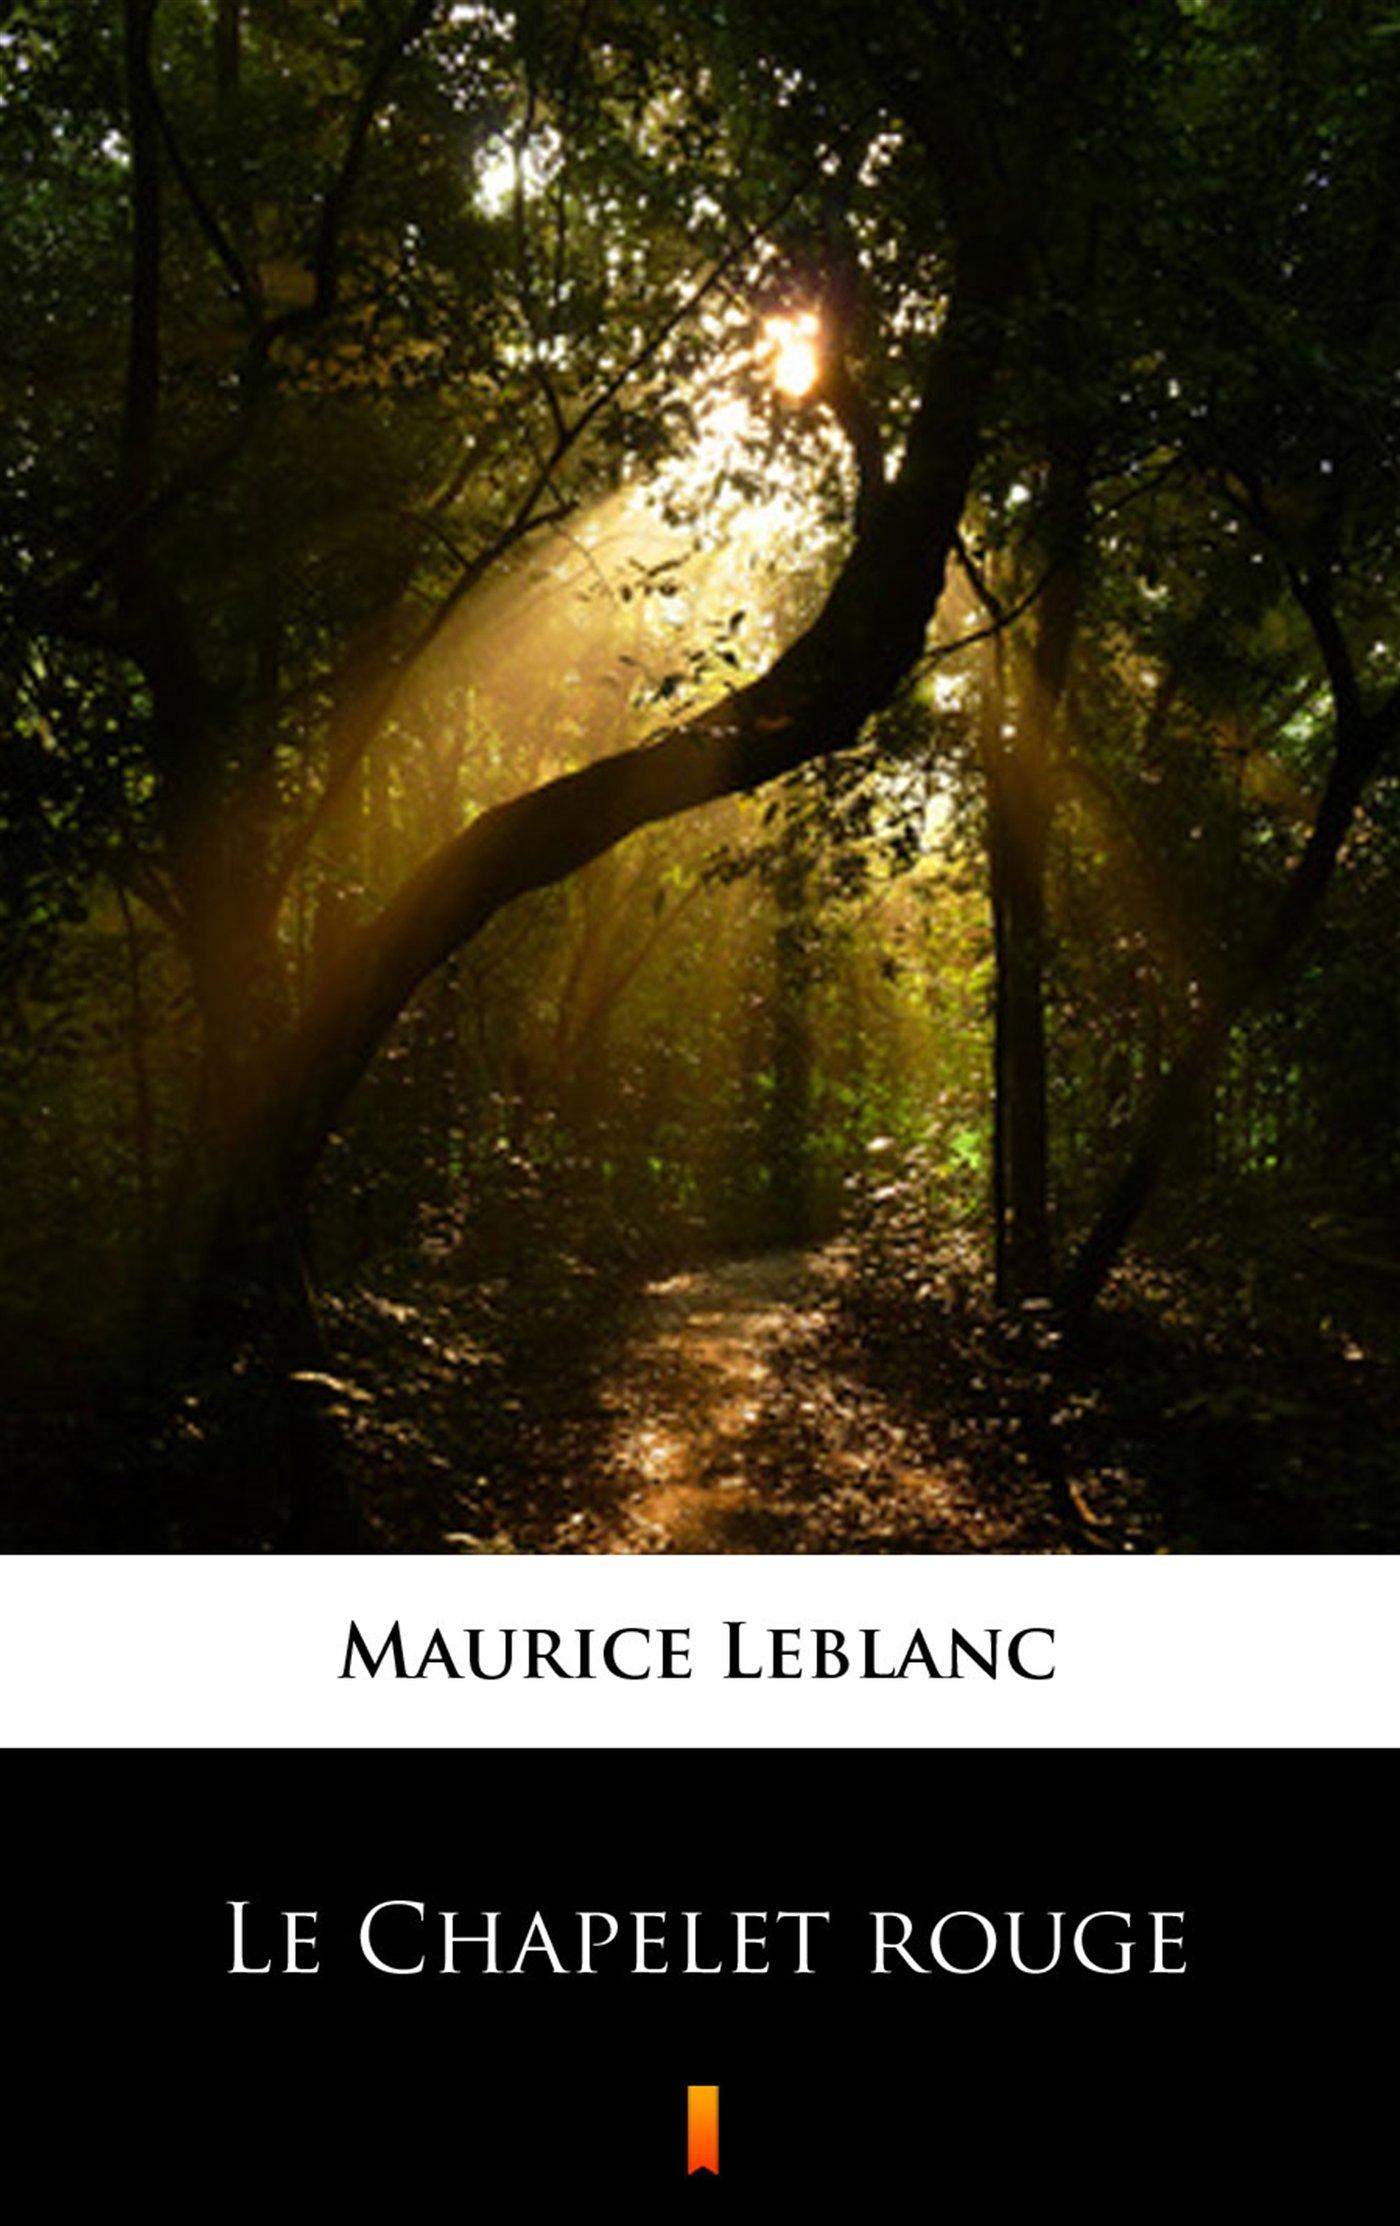 Le Chapelet rouge - Ebook (Książka na Kindle) do pobrania w formacie MOBI